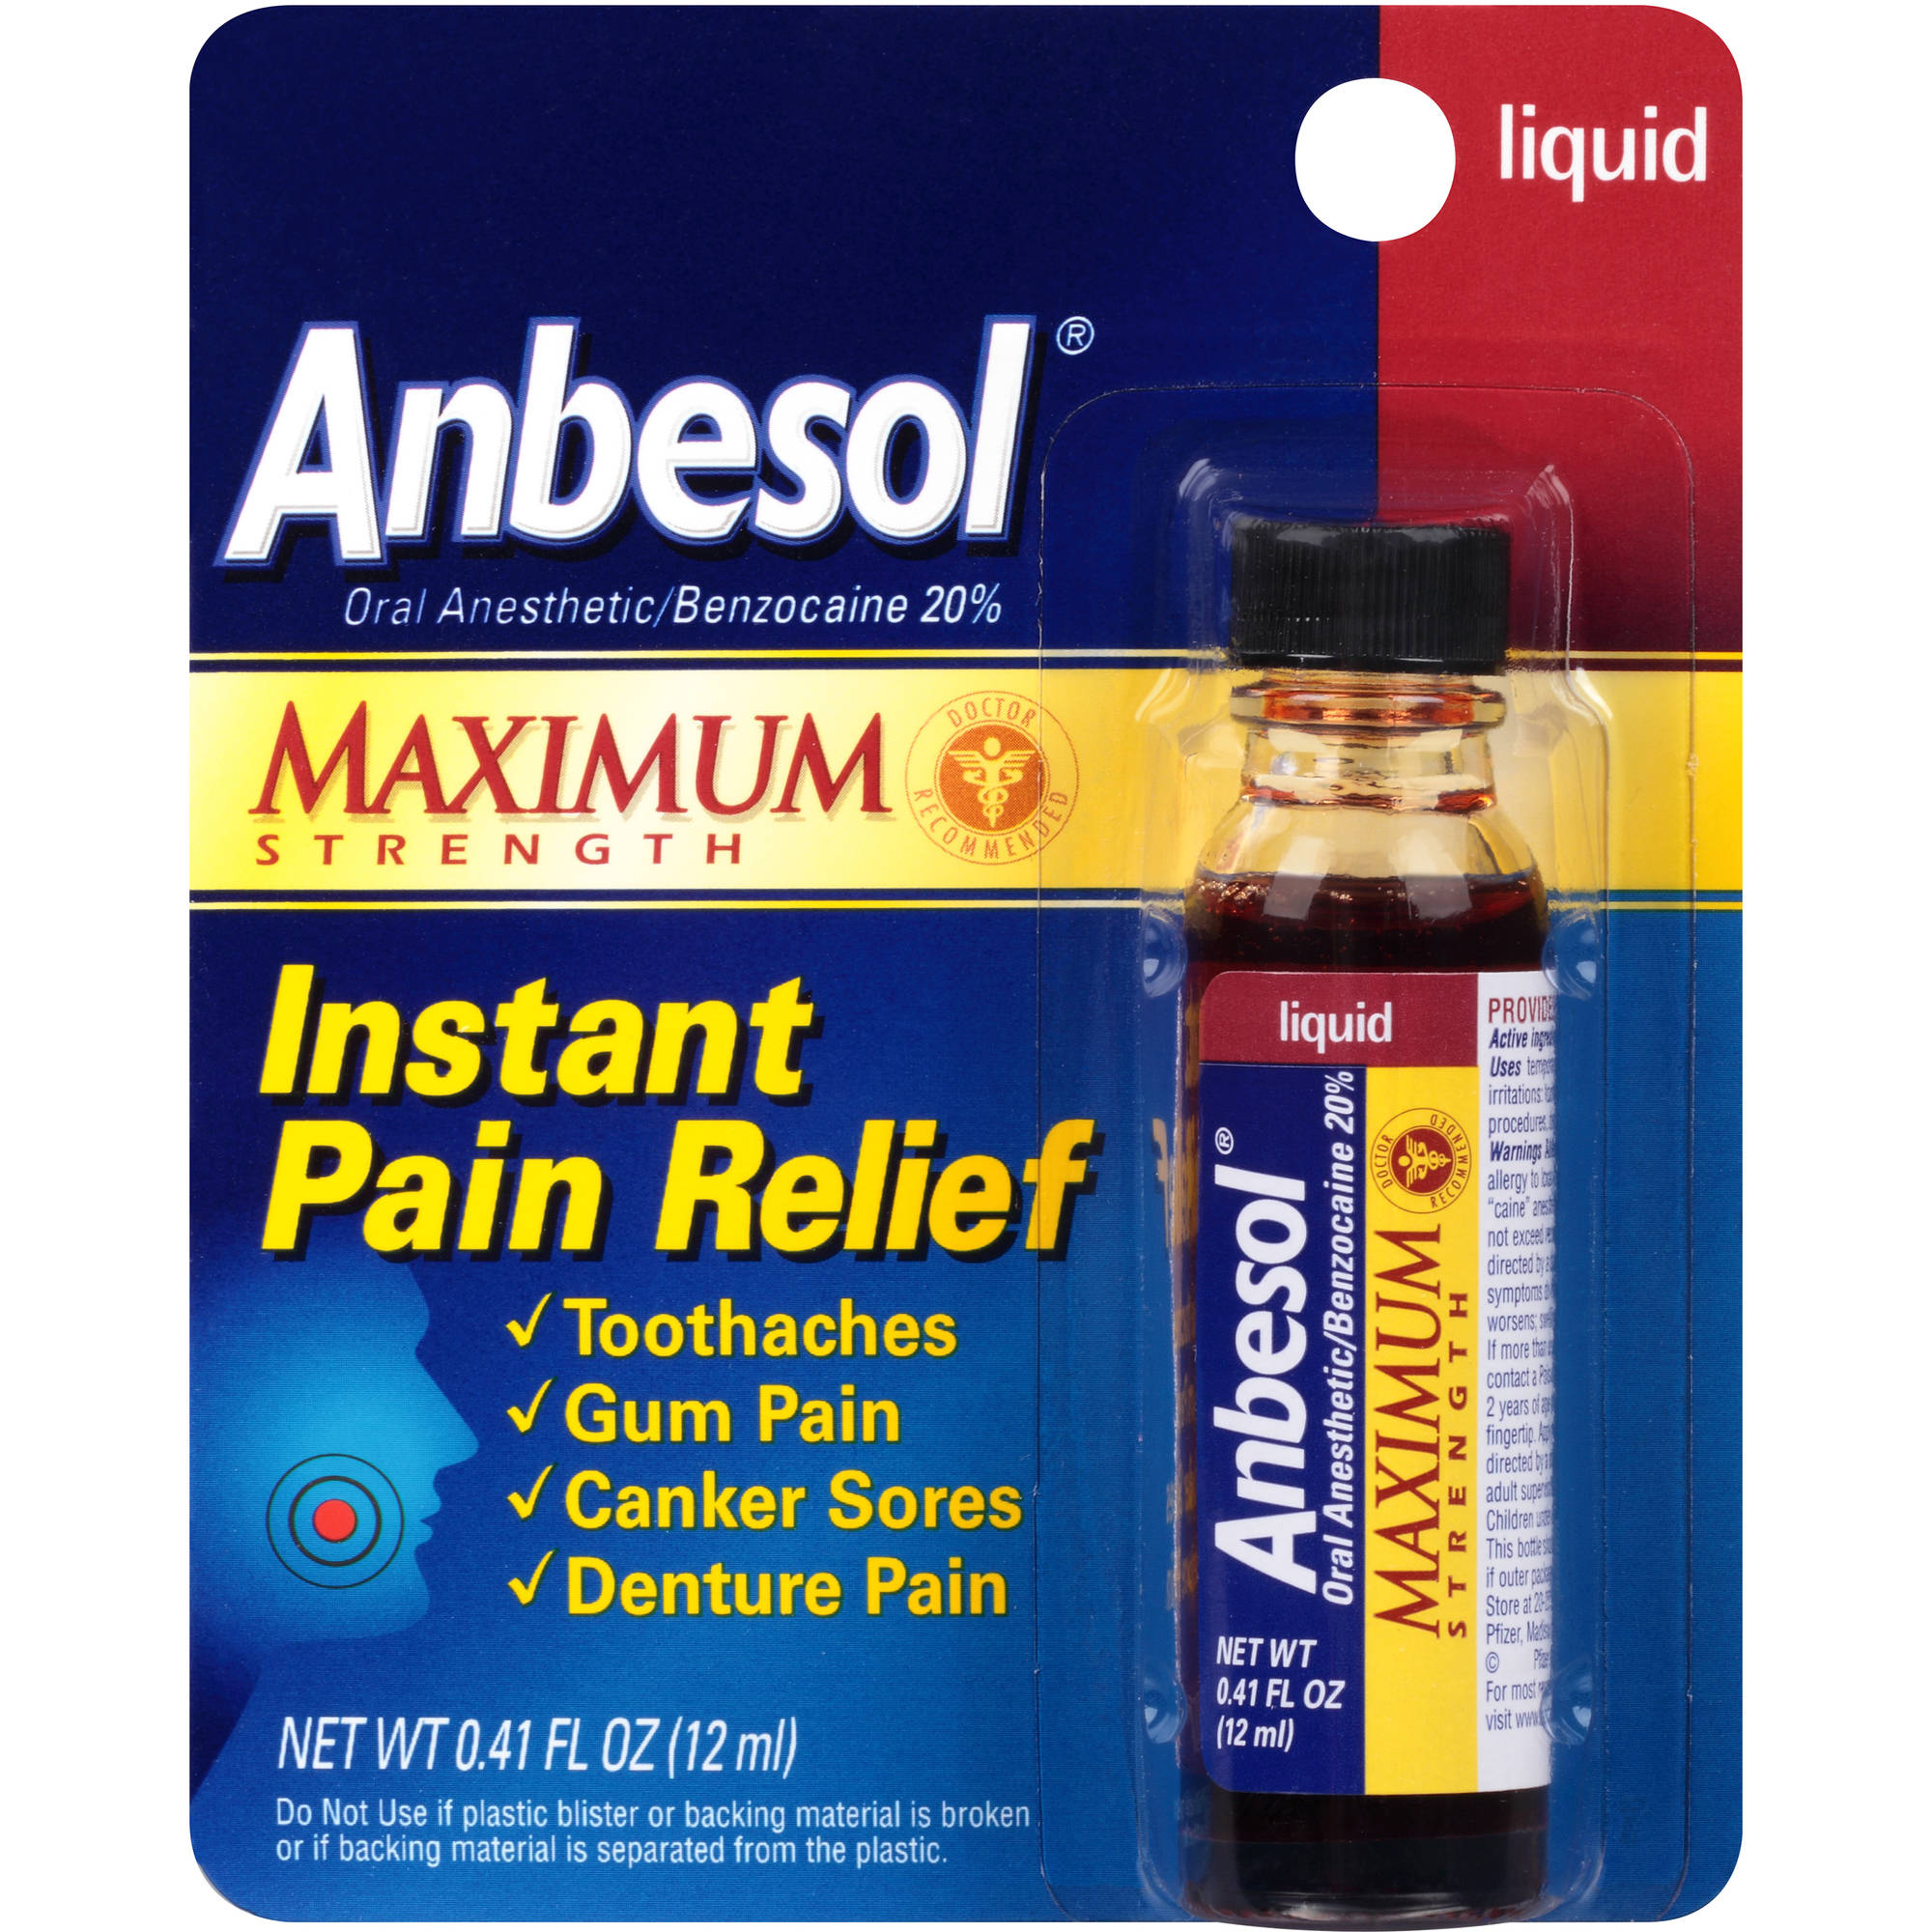 Anbesol Maximum Strength Oral Anesthetic Liquid 0.41 fl oz